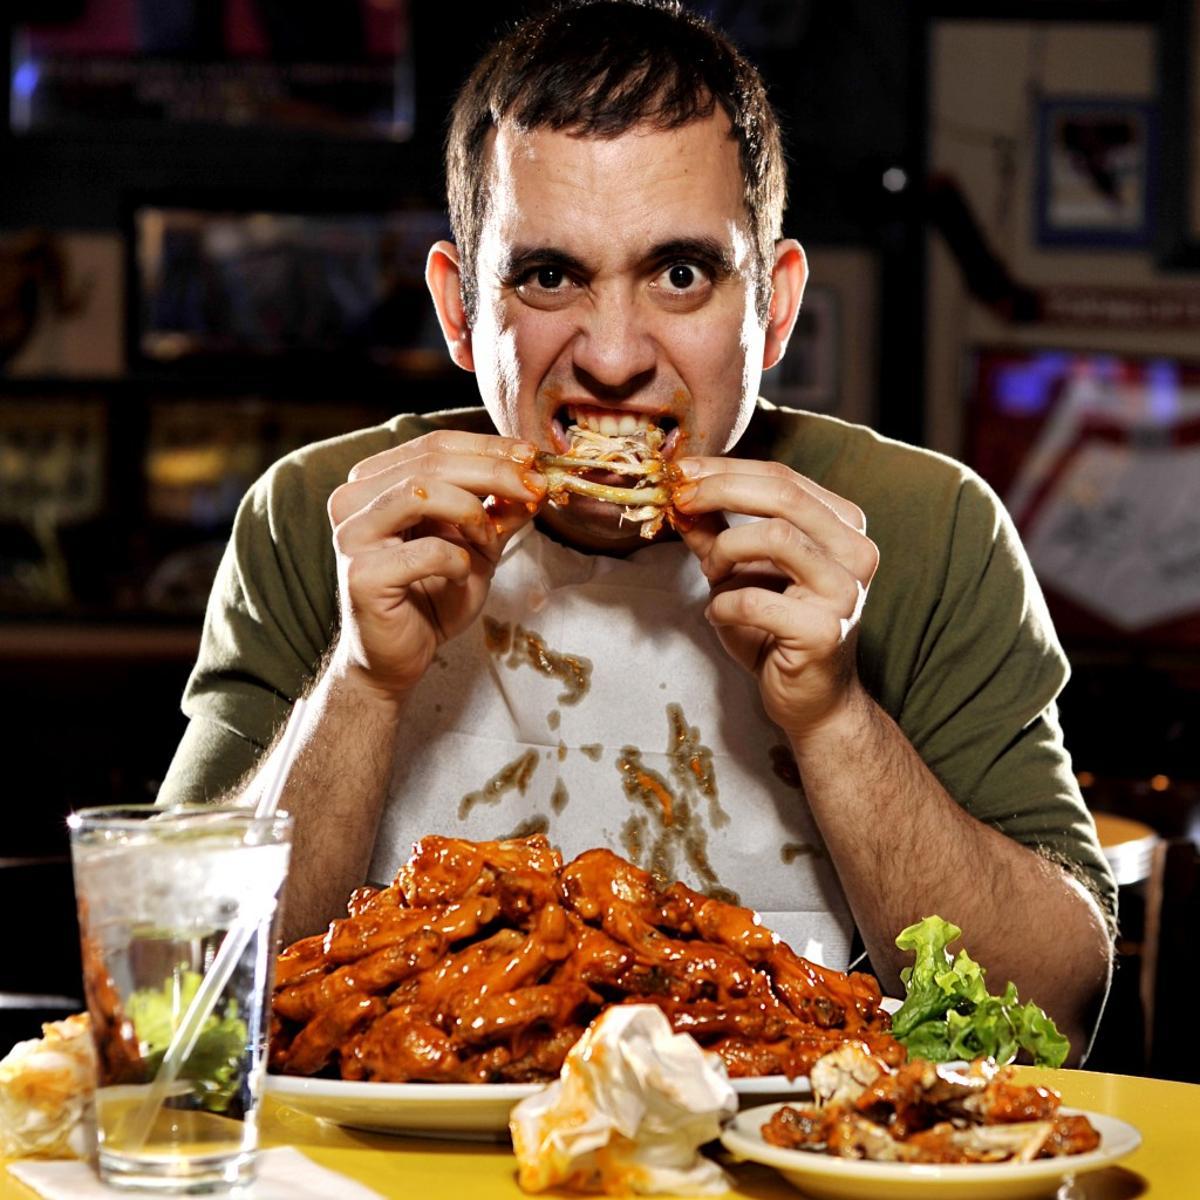 Man eating chicken wings